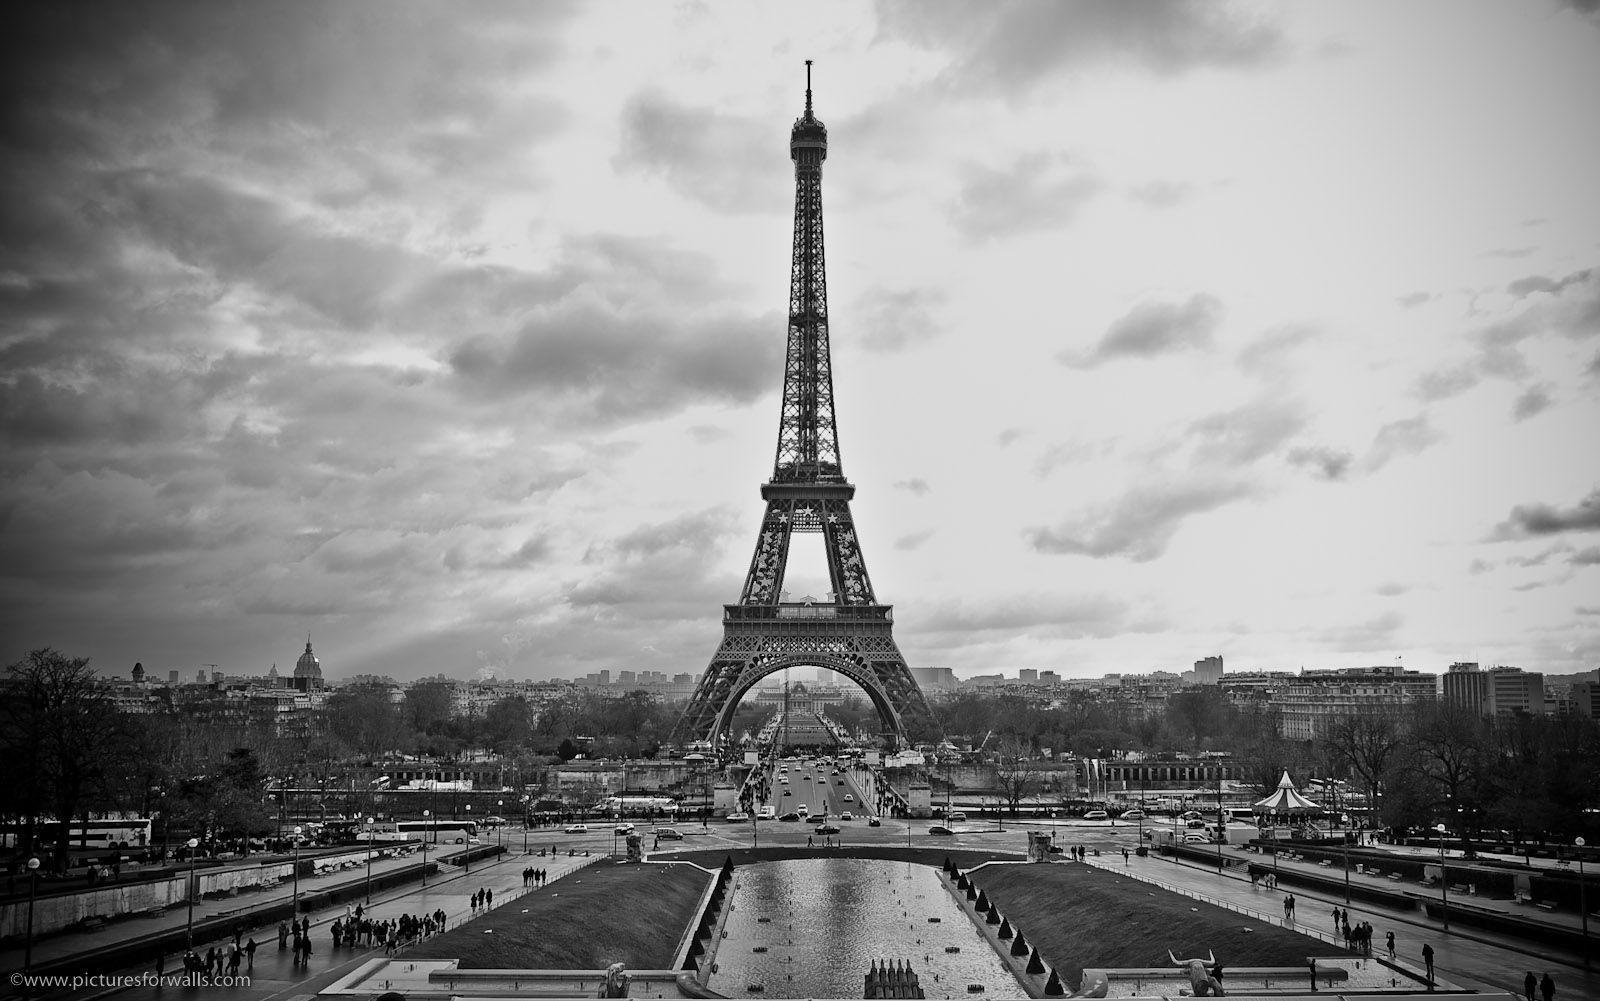 Hd wallpaper paris - Paris Wallpaper Hd Collection For Free Download